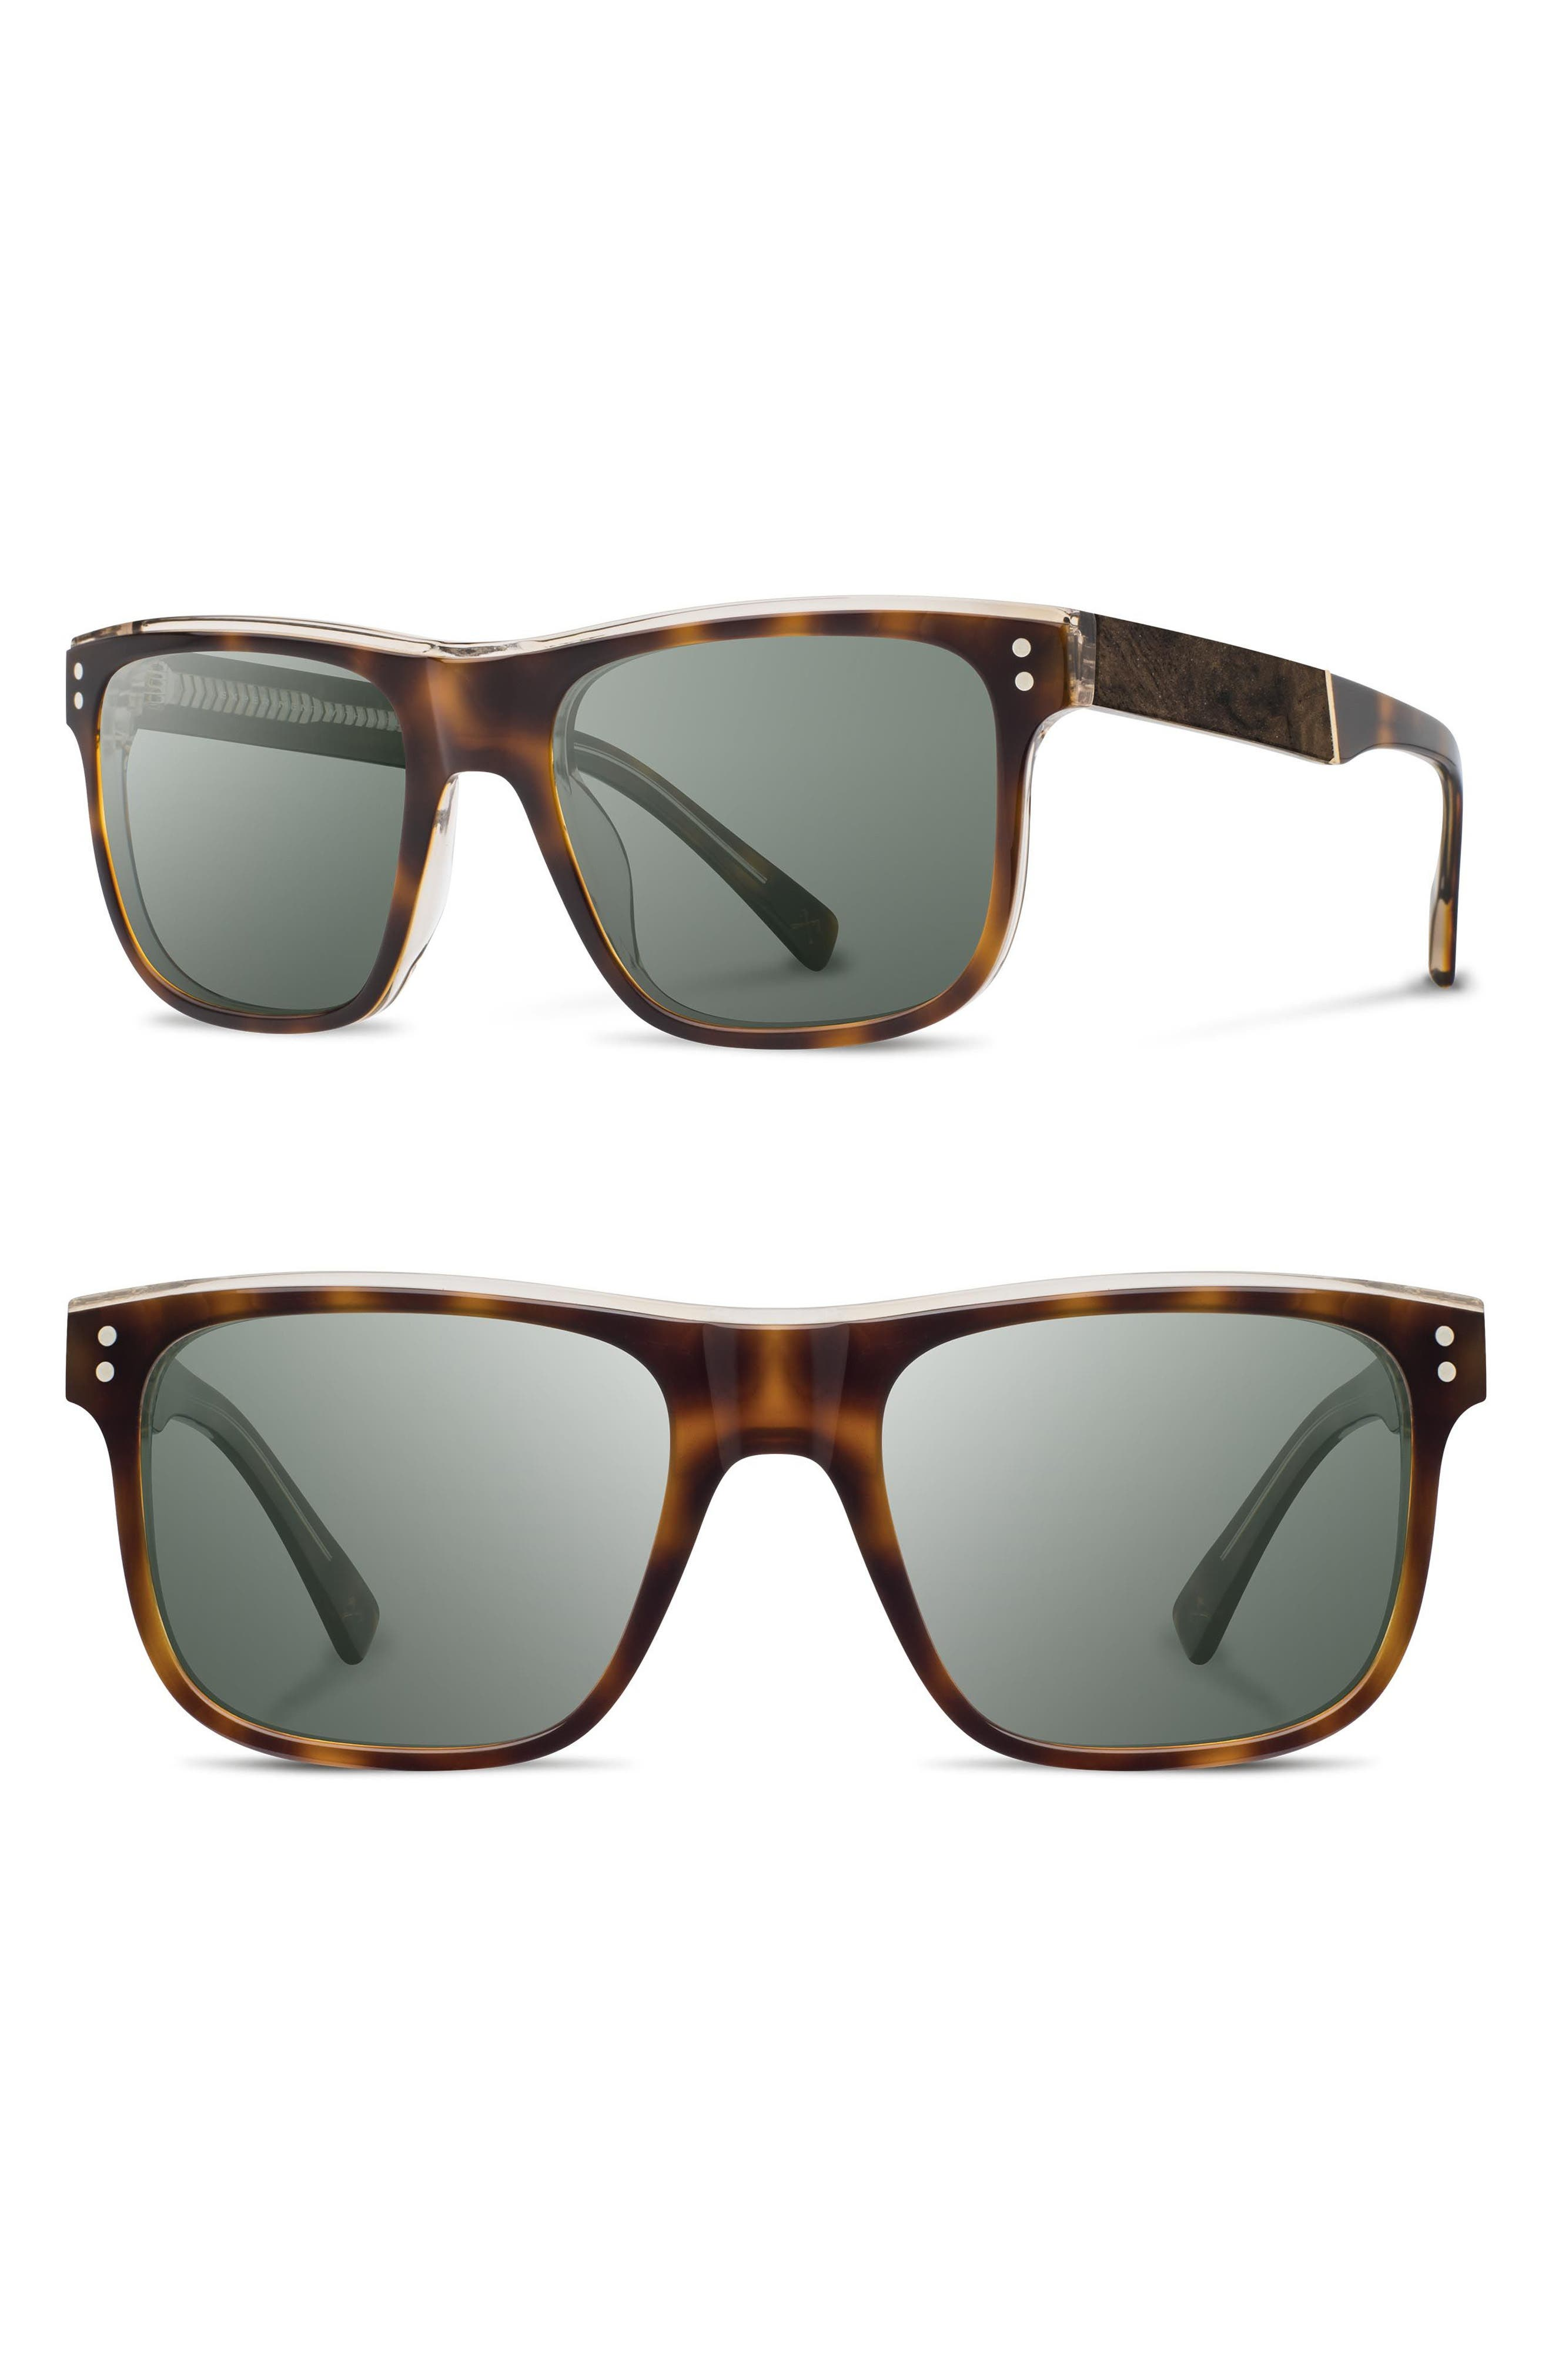 Monroe 55mm Polarized Sunglasses,                         Main,                         color, Brindle/ Elm/ G15pol